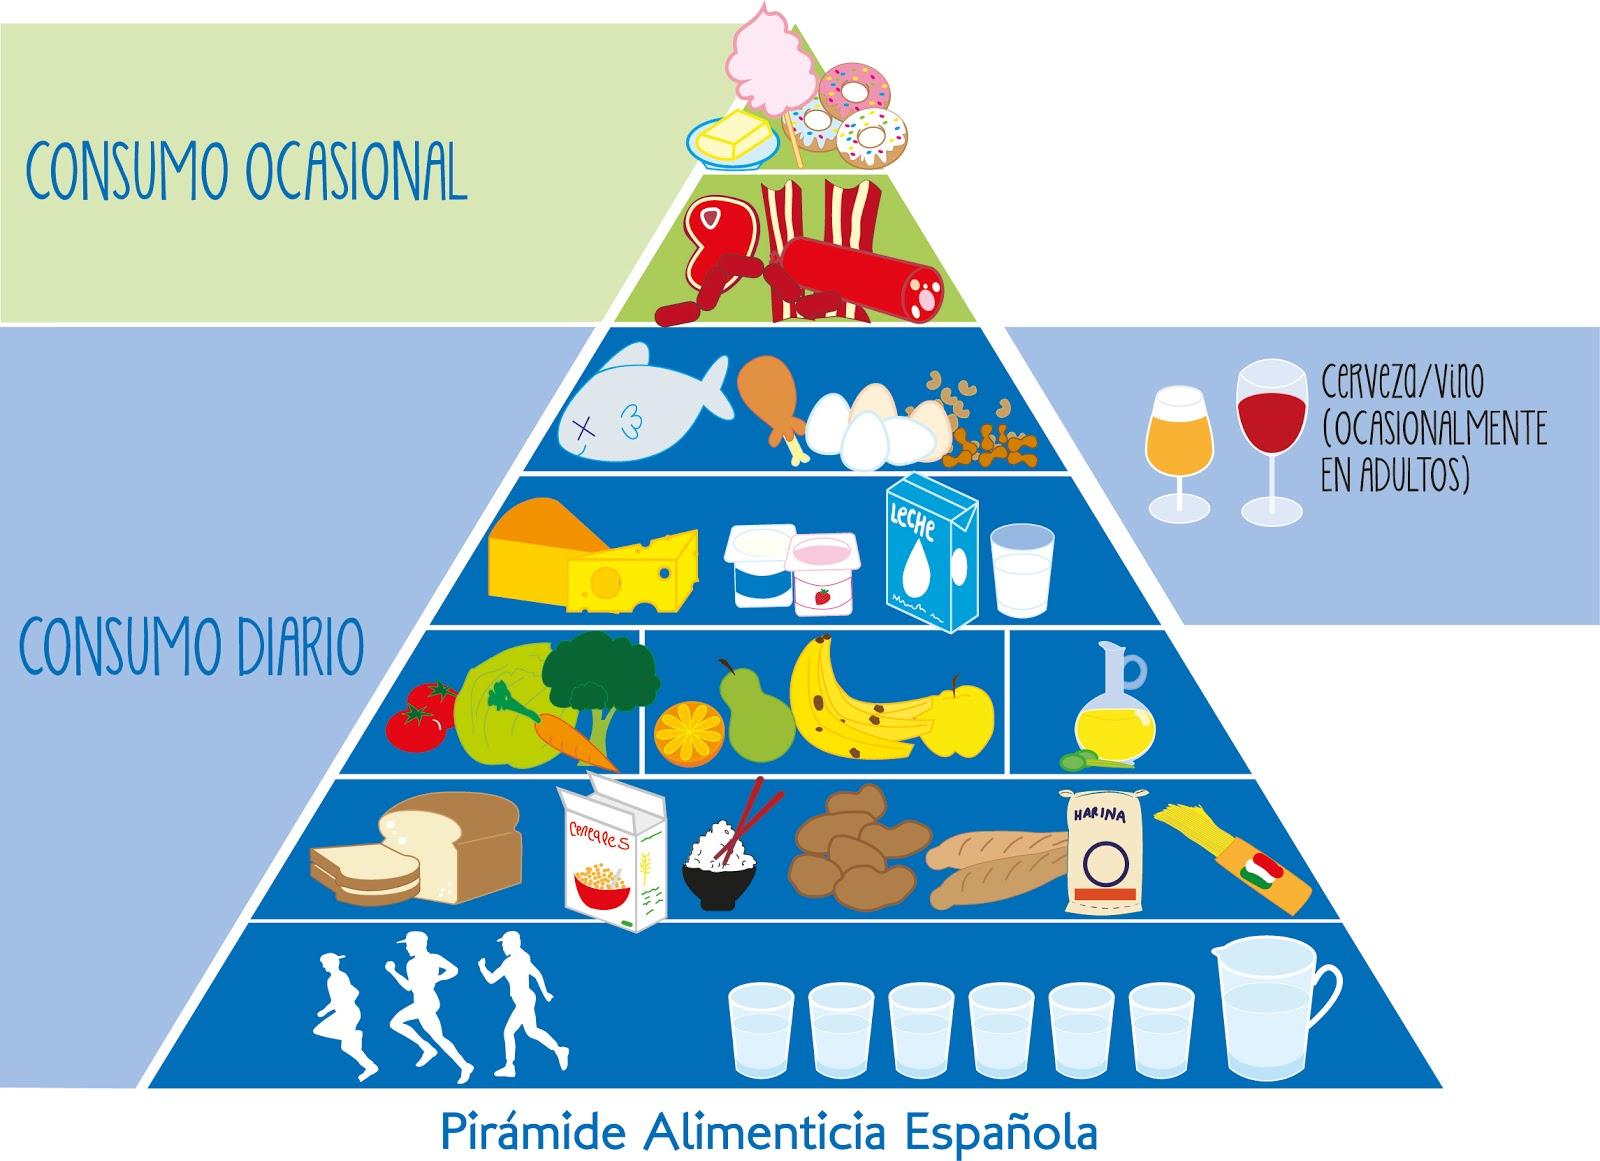 Rainbows, Lollipops And Zombies: Pirámide Alimenticia